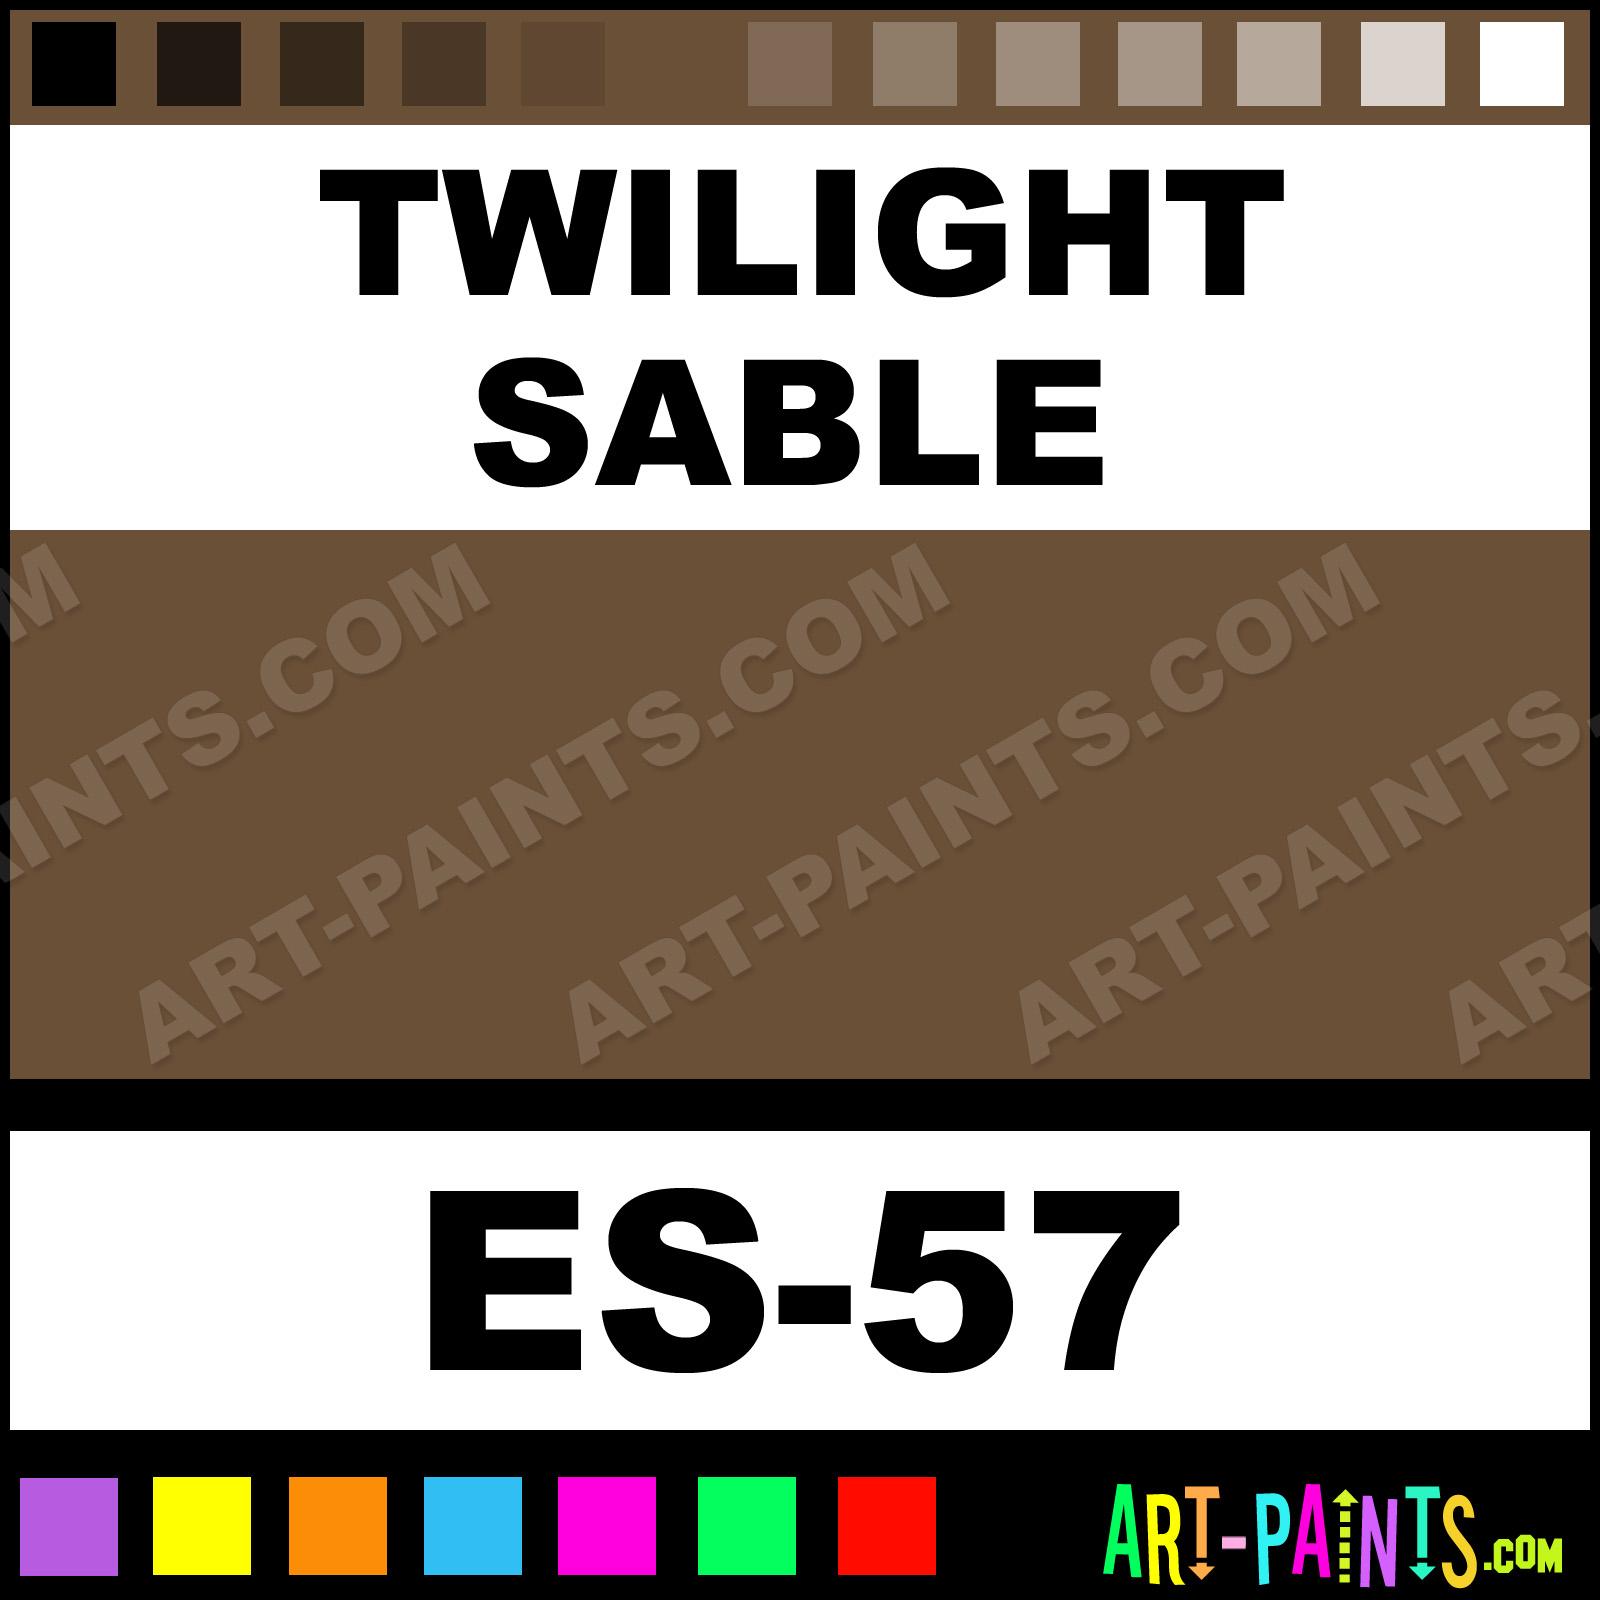 twilight sable - Sable Color